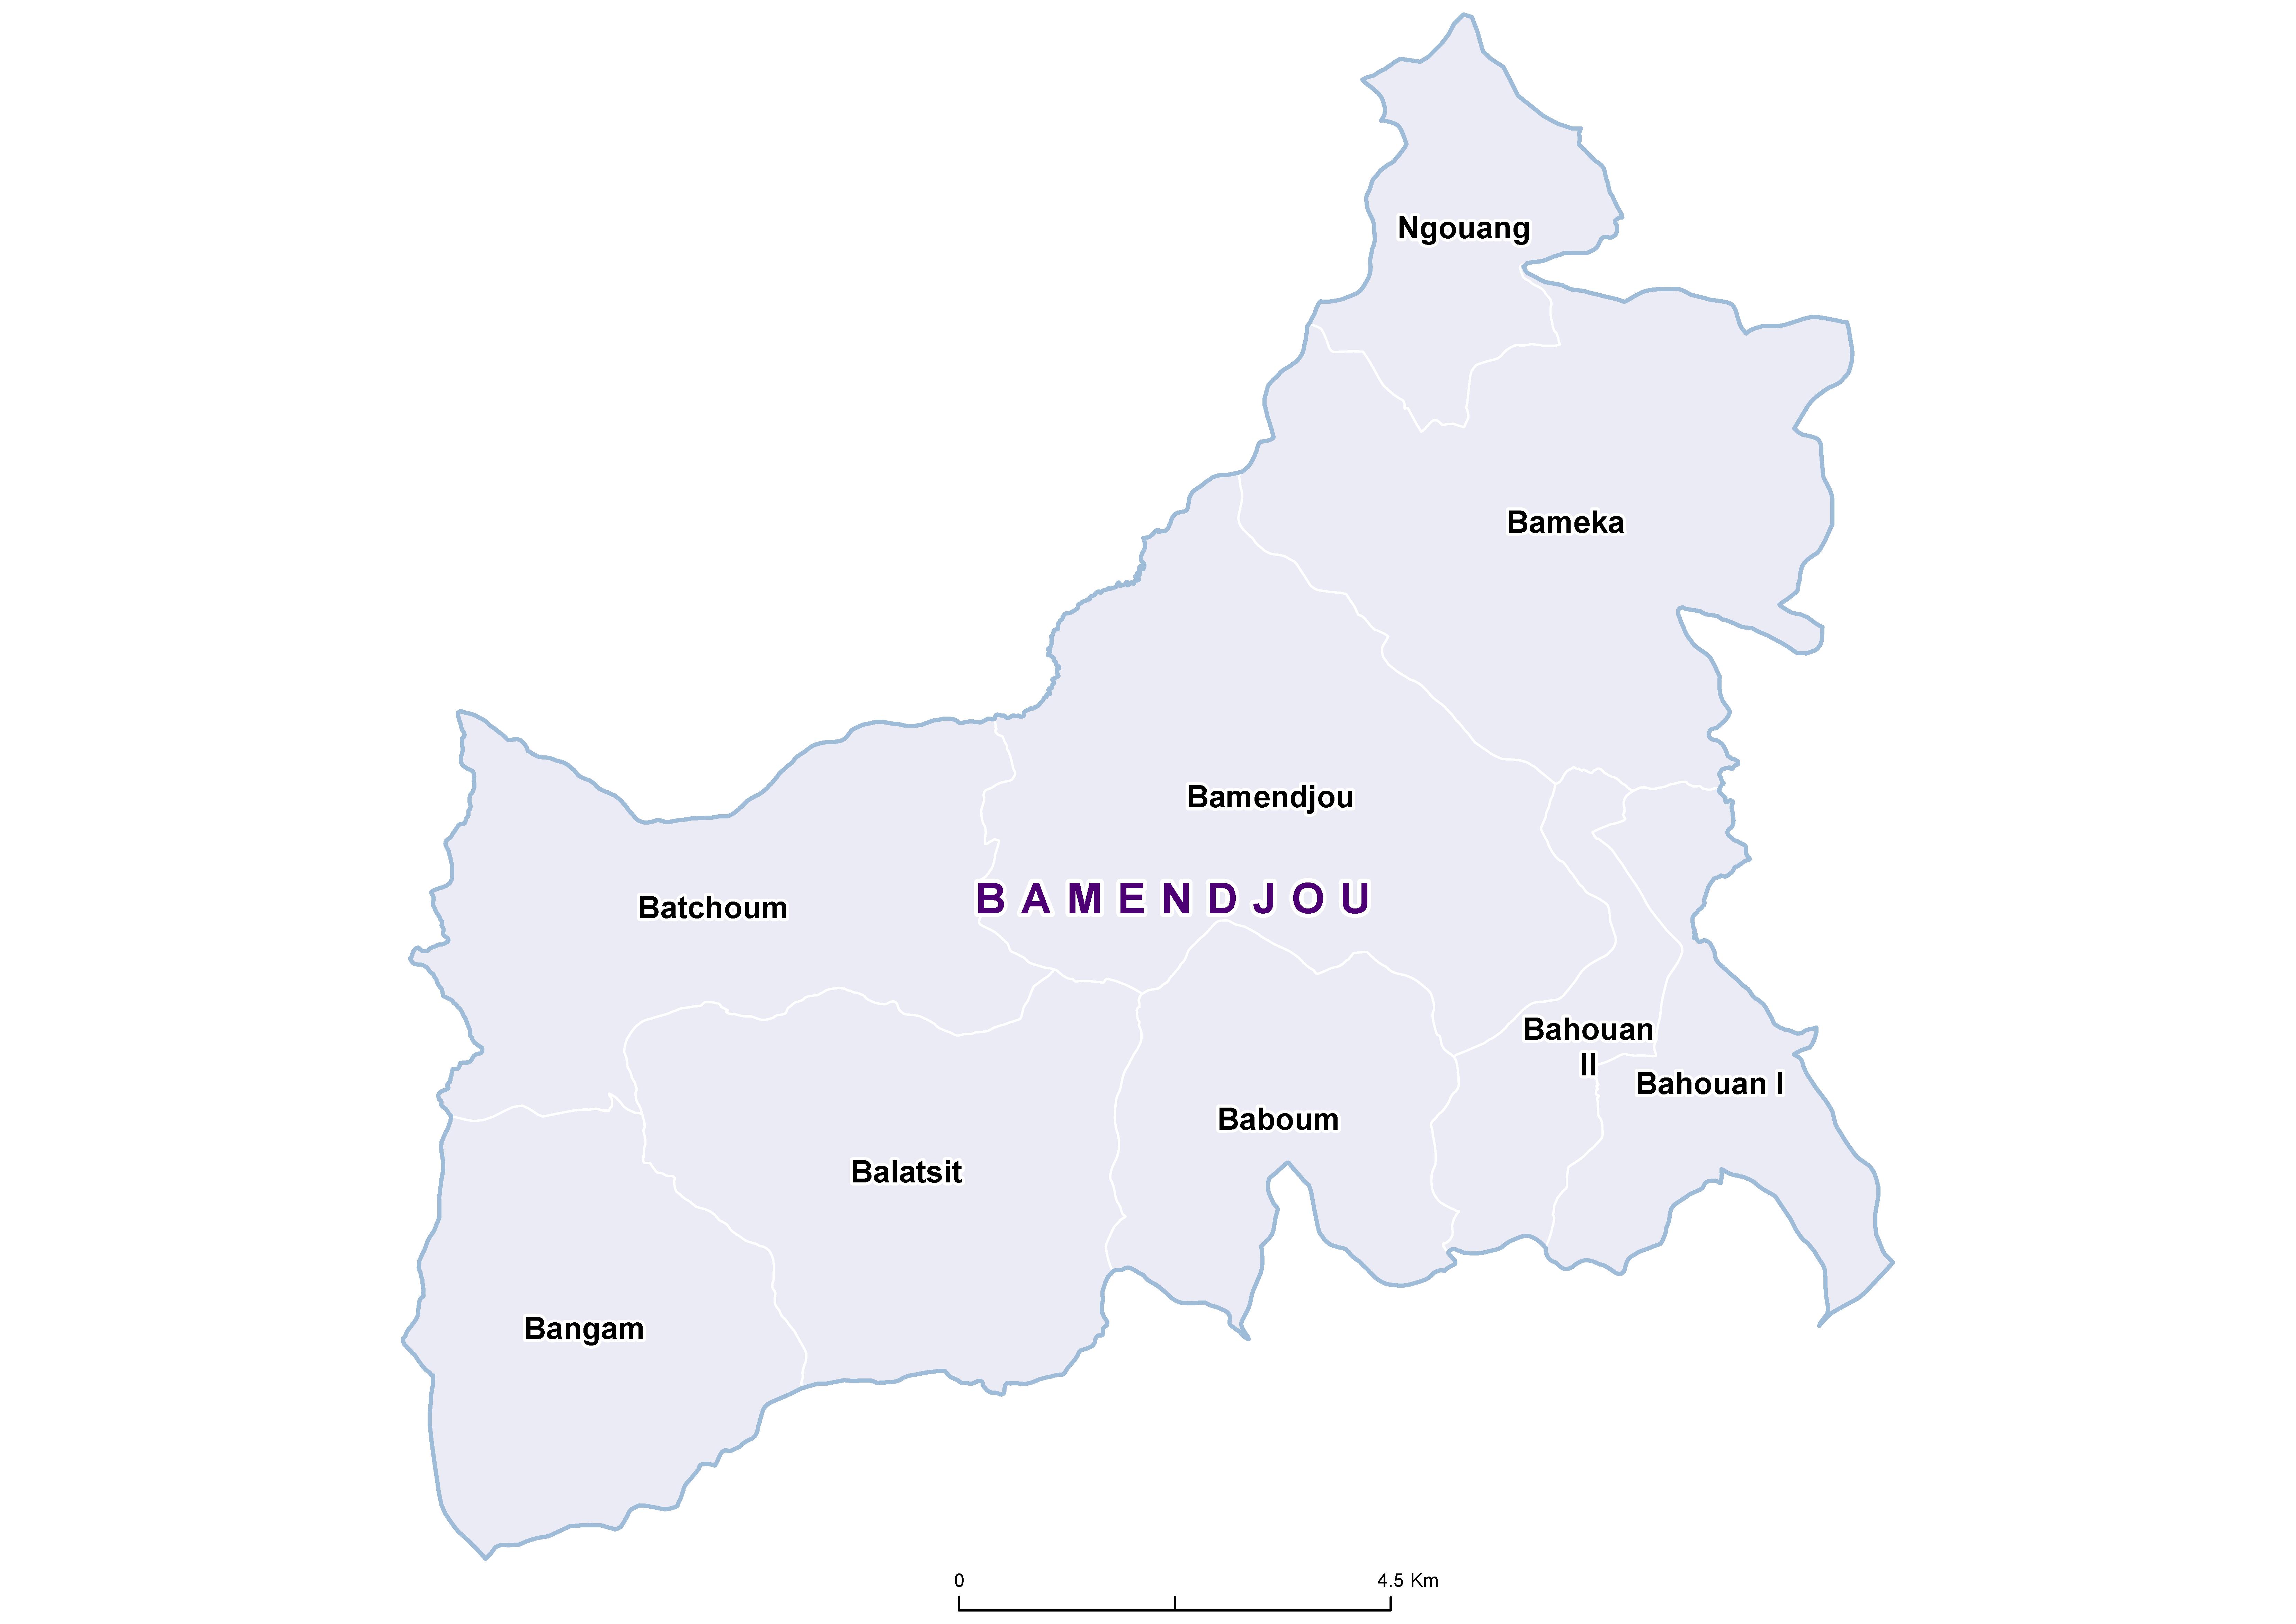 Bamendjou SCH 20180001